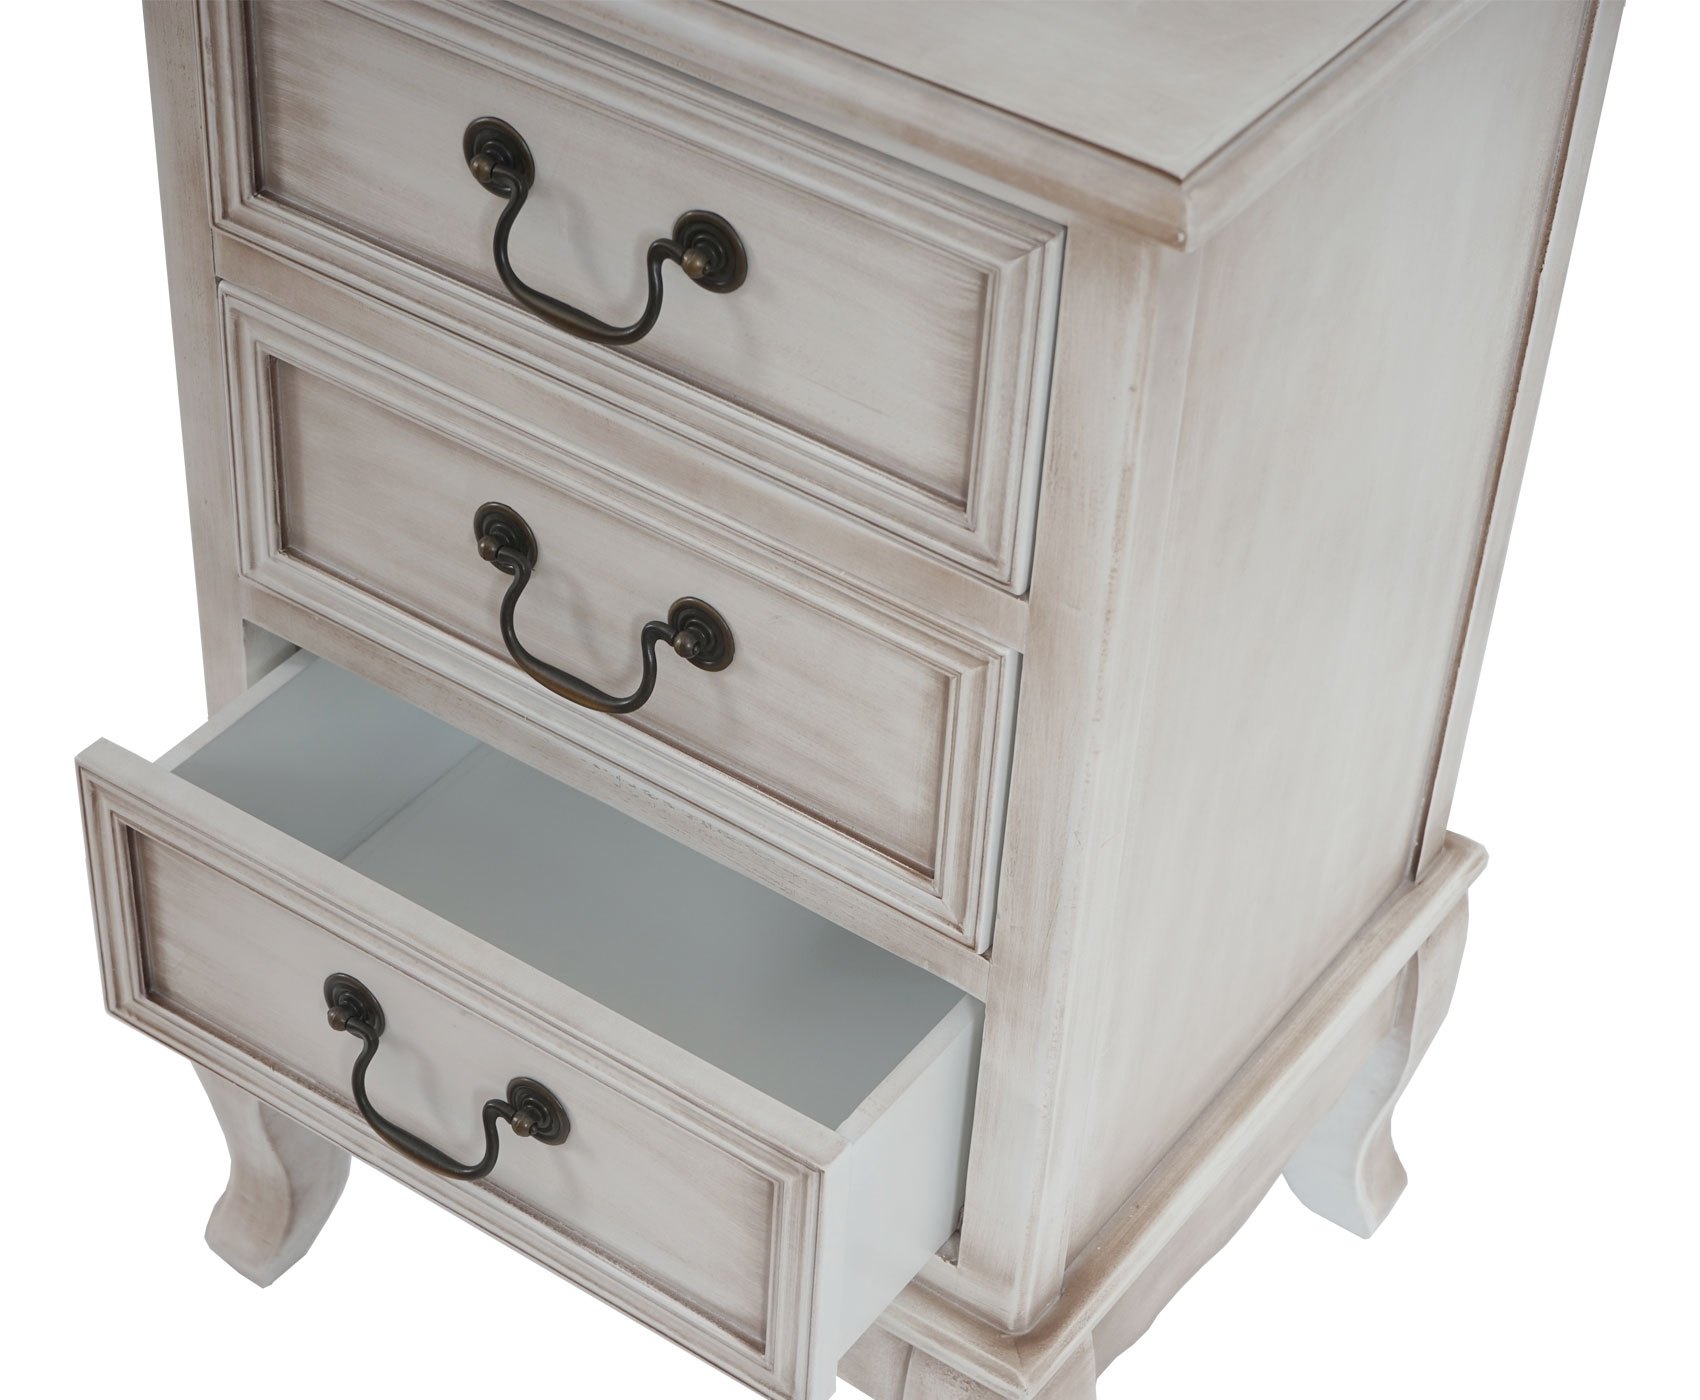 kommode gela t435 schrank barock antik 3 schubladen wei antik kaufen bei mendler. Black Bedroom Furniture Sets. Home Design Ideas